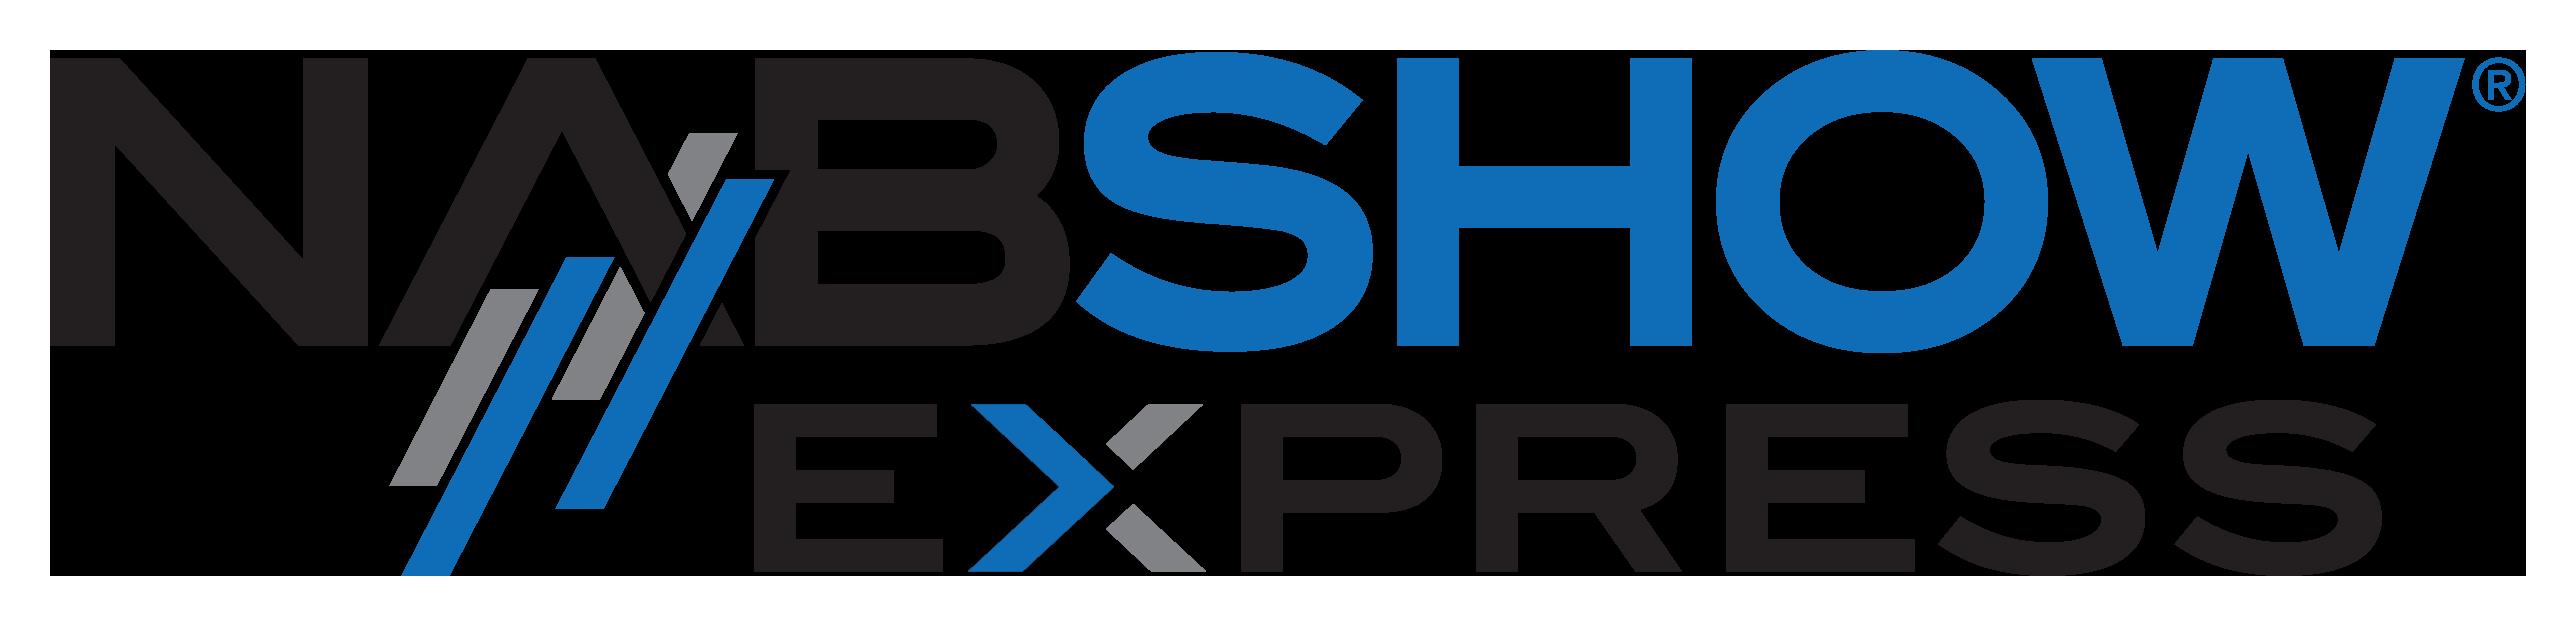 NAB Show Express Logo